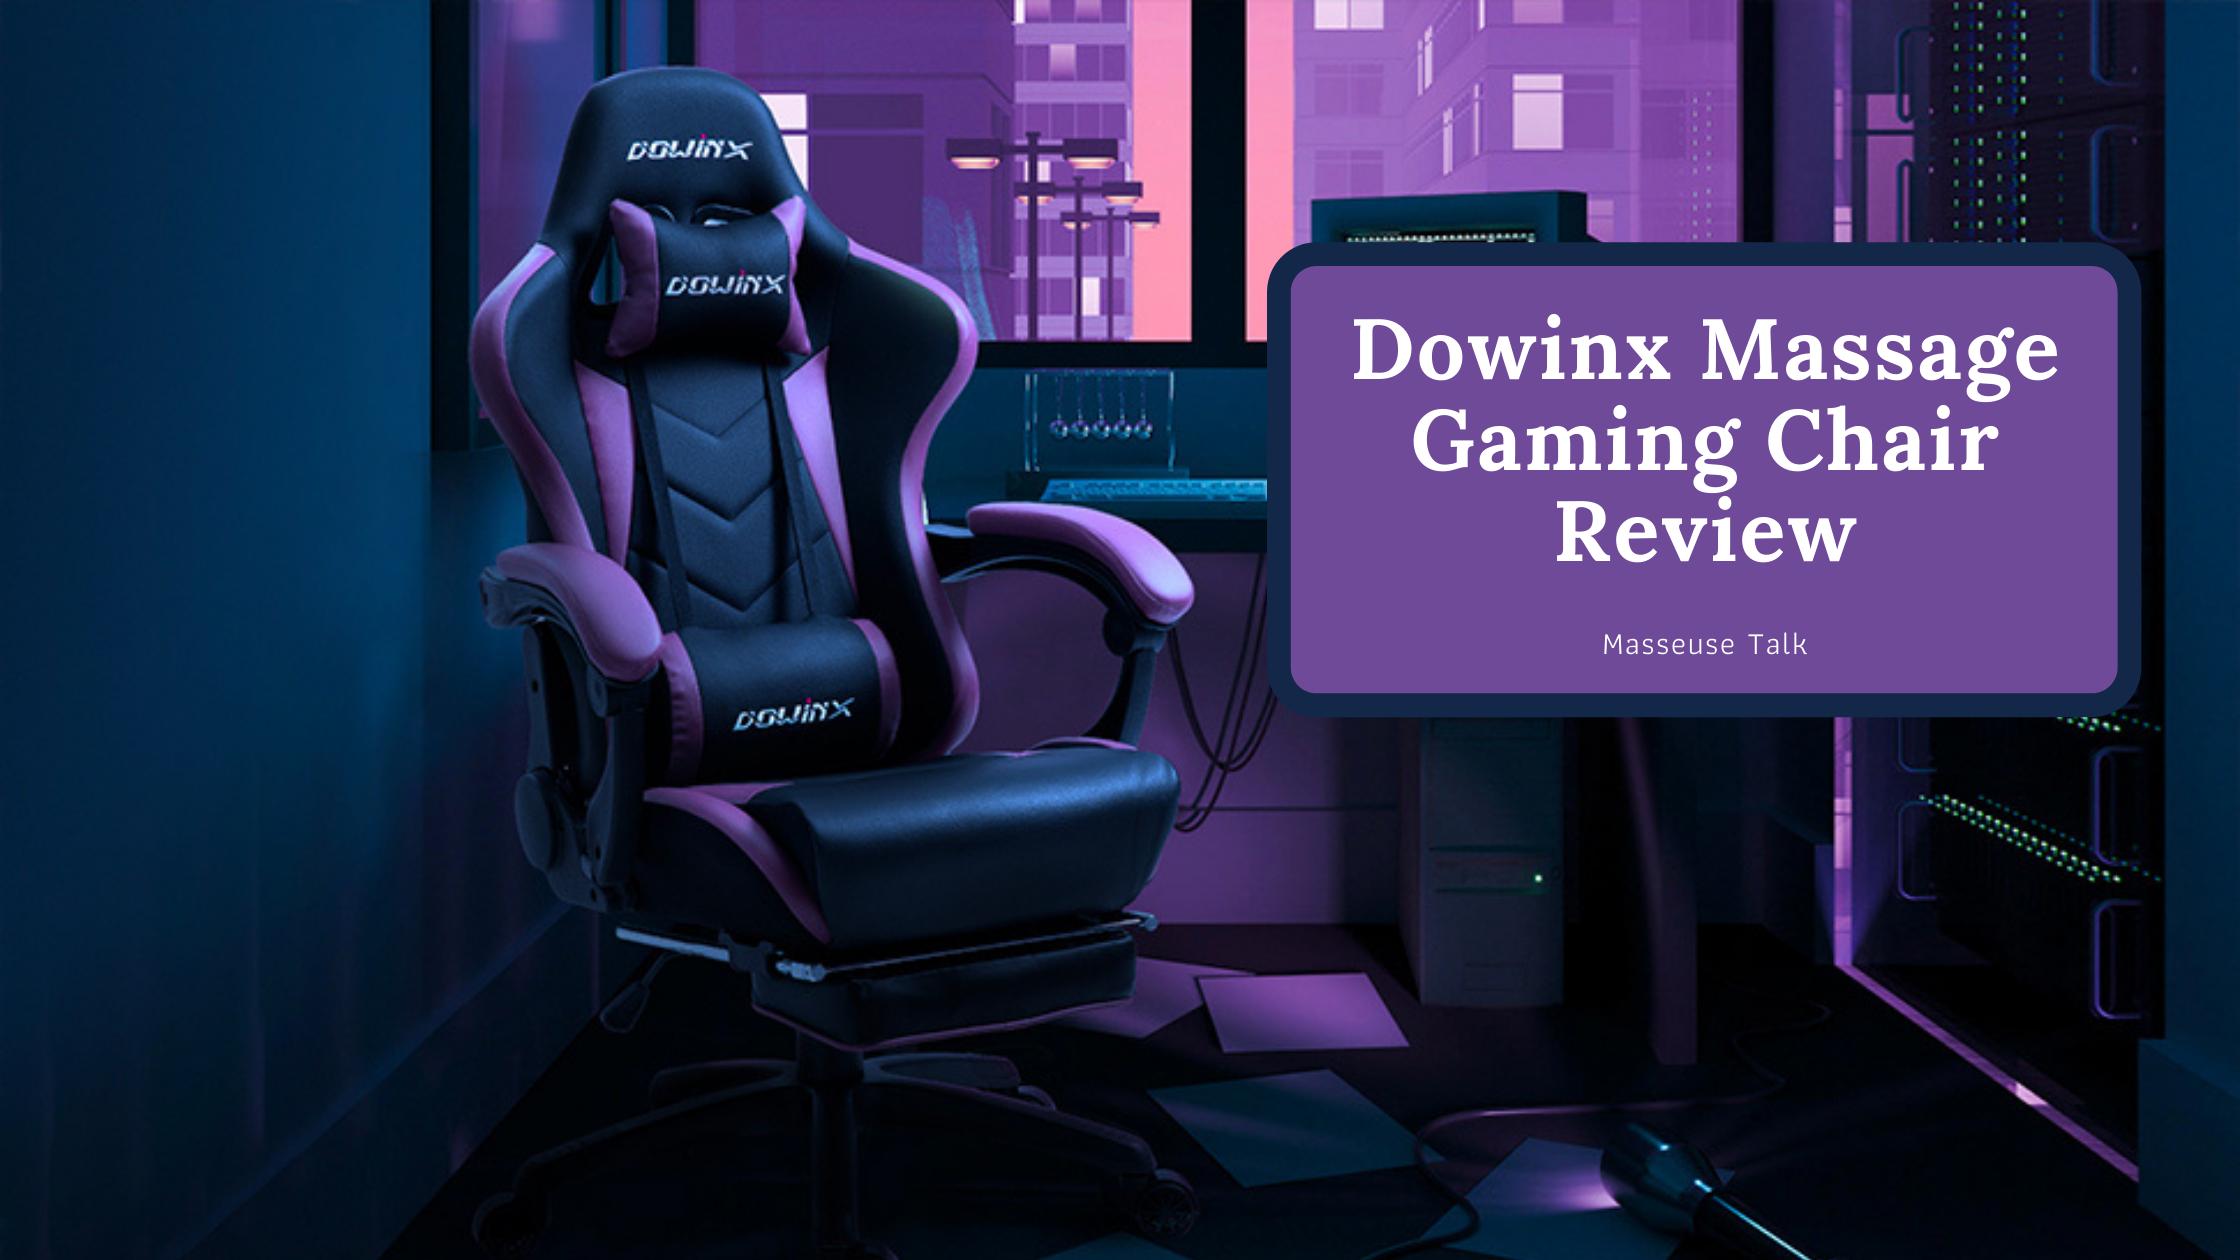 Dowinx Massage Gaming Chair